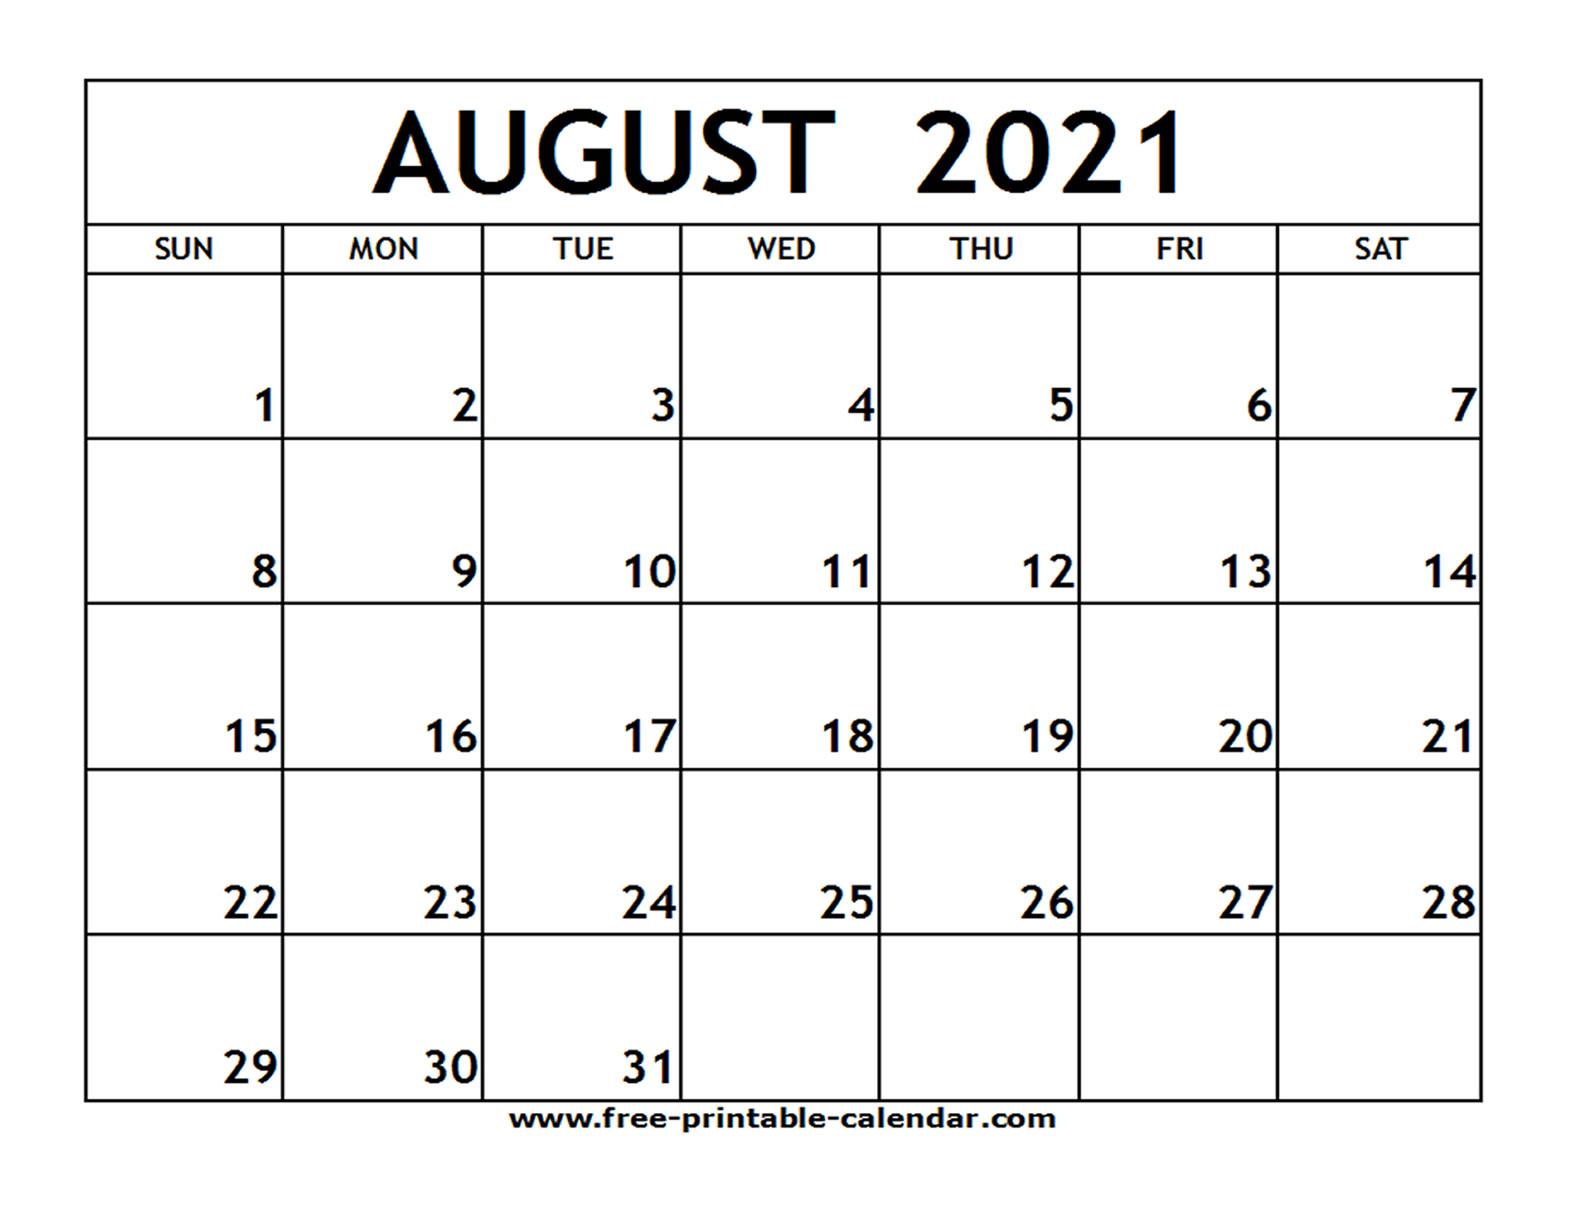 June July Aug 2021 Printable Calanders   Calendar for August 2021 Calendar Print